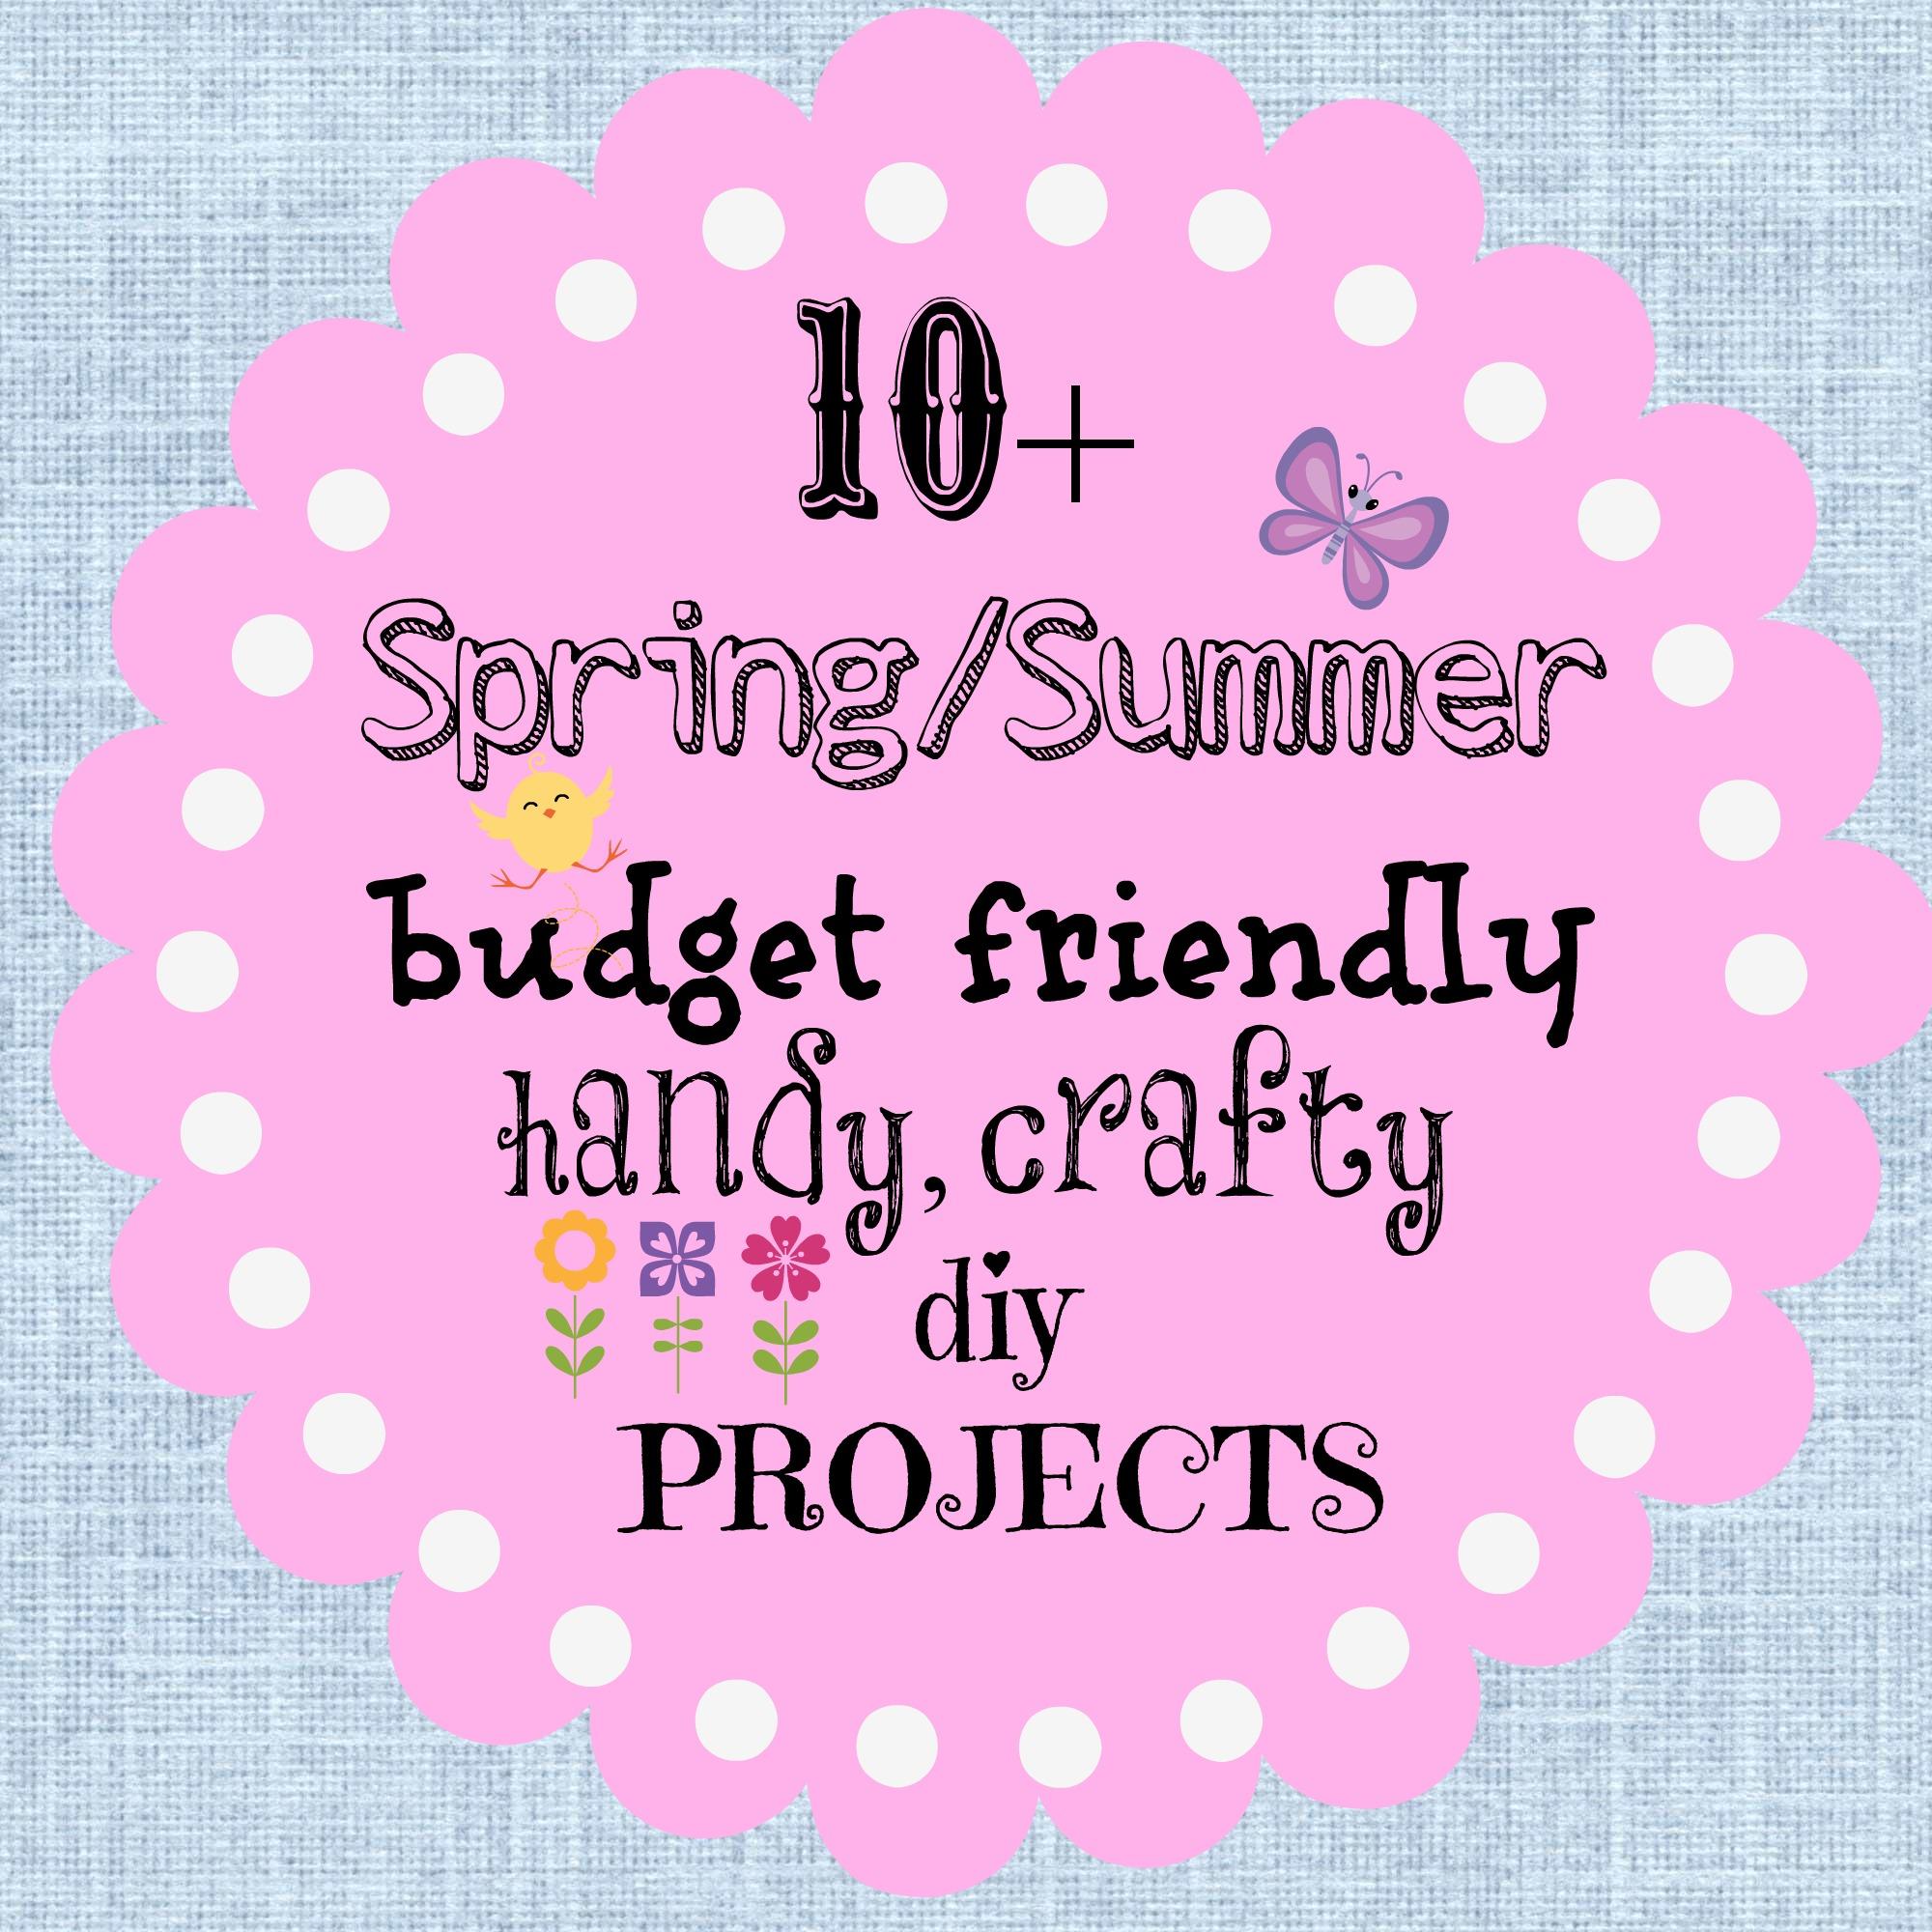 Spring-summer budget friendly crafts